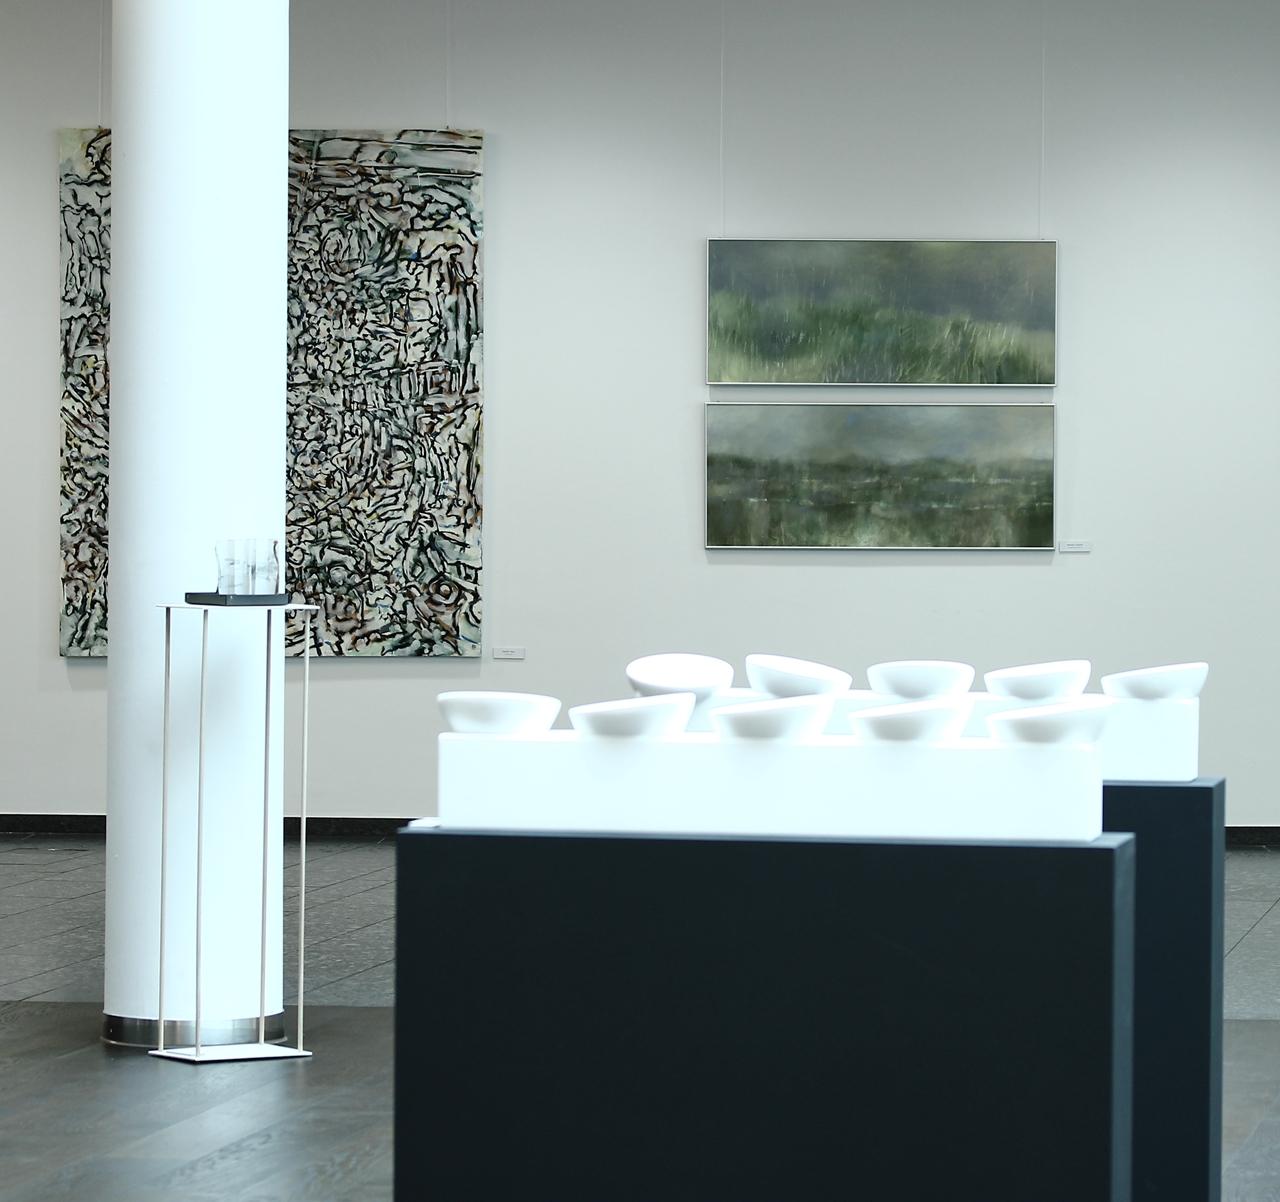 kunst marlies blauth ausstellung big b ng in dortmund. Black Bedroom Furniture Sets. Home Design Ideas